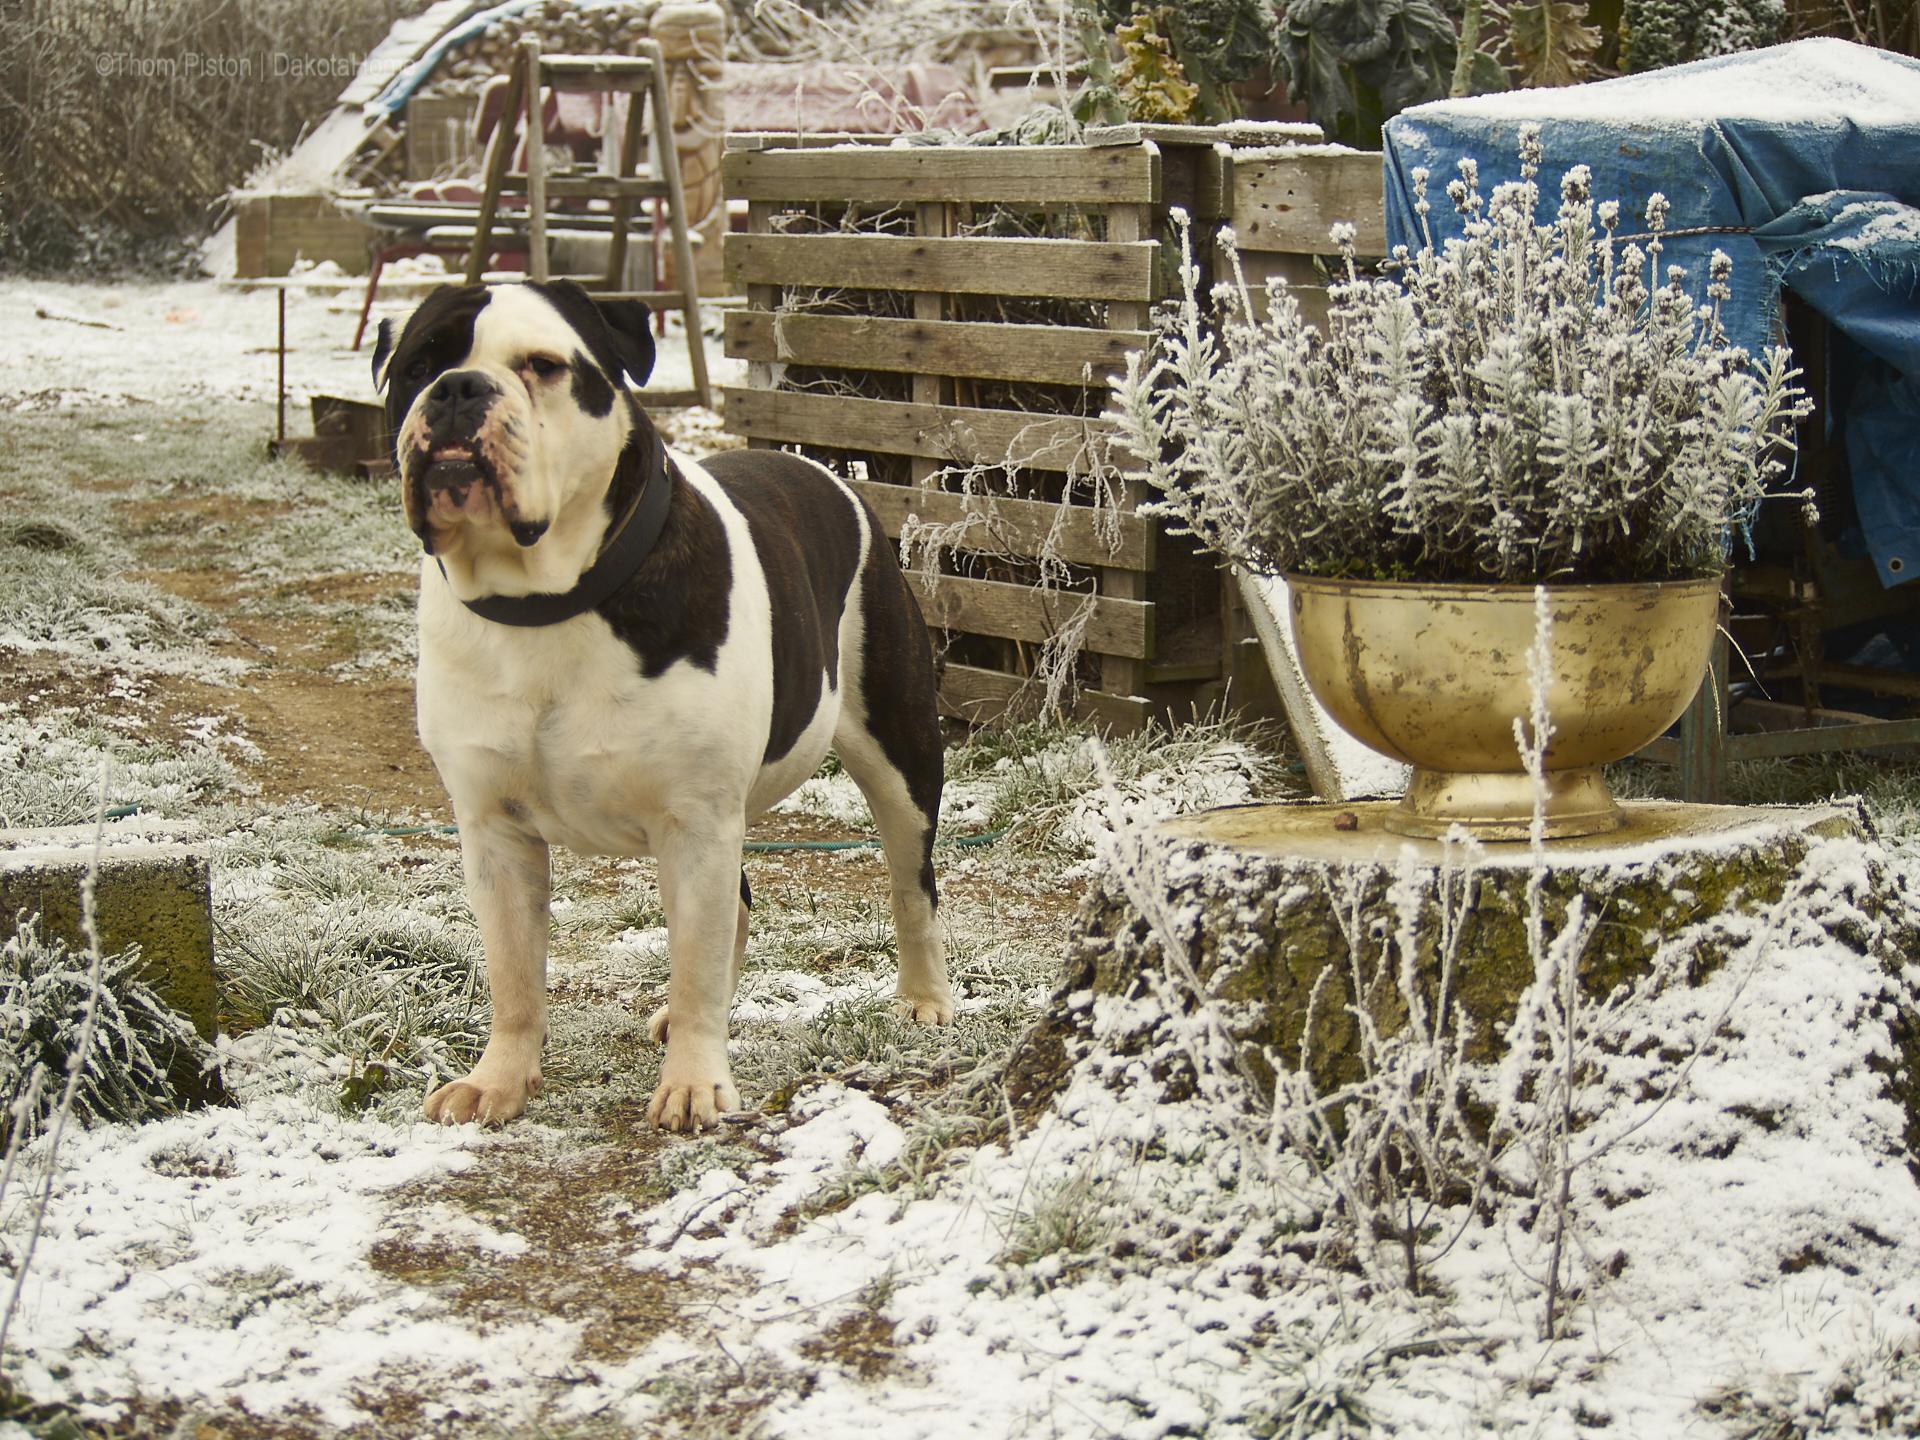 Alwin der Eisbär, aehm nö, die Bulldogge at Dakota Home Mitte Januar 2019